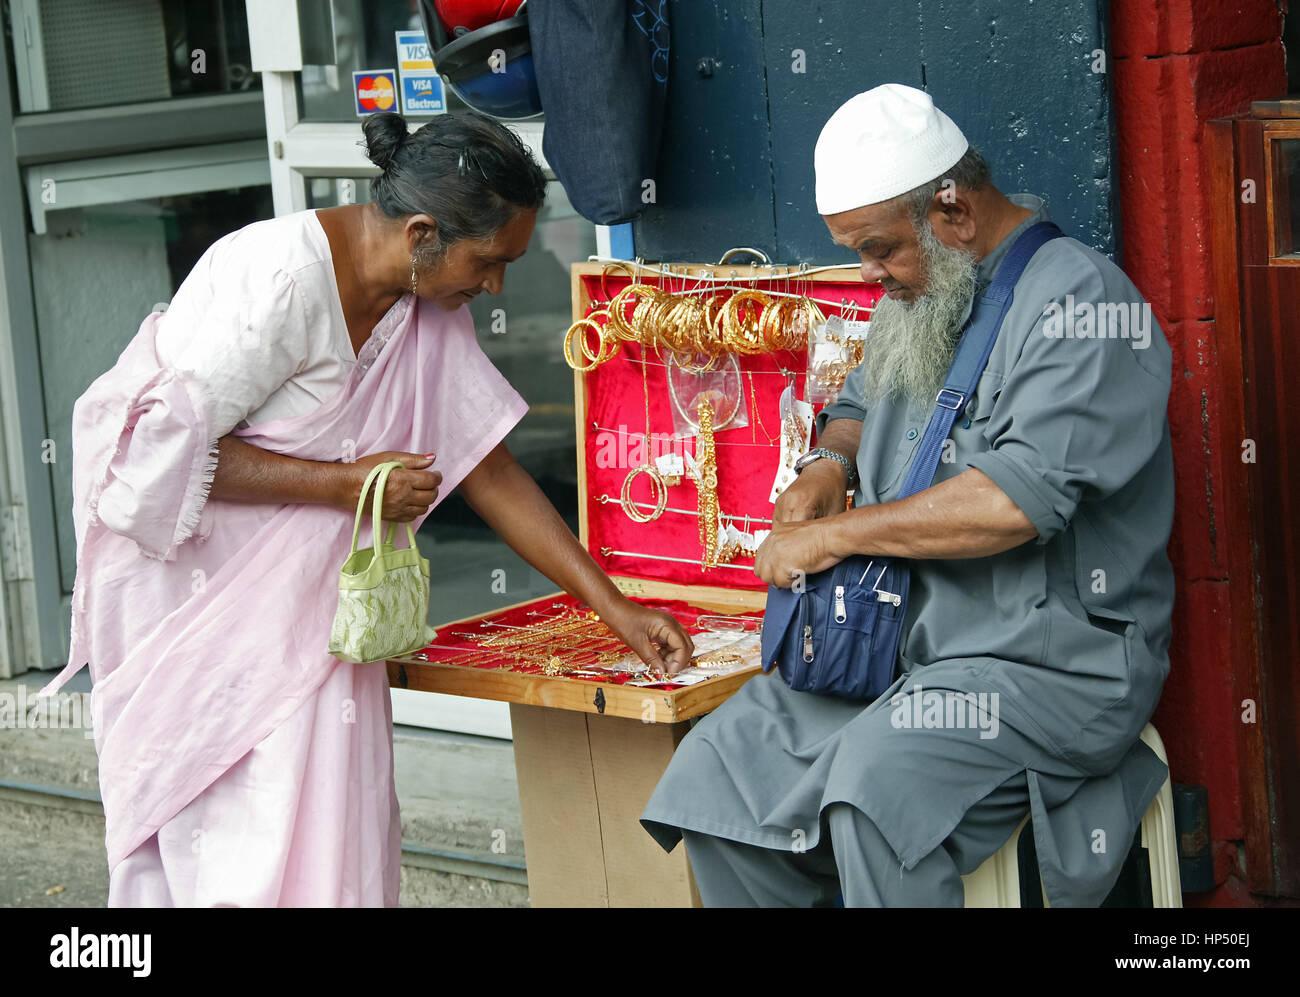 Port Louis, street scene,Mauritius, Port Louis, street vendor - Stock Image